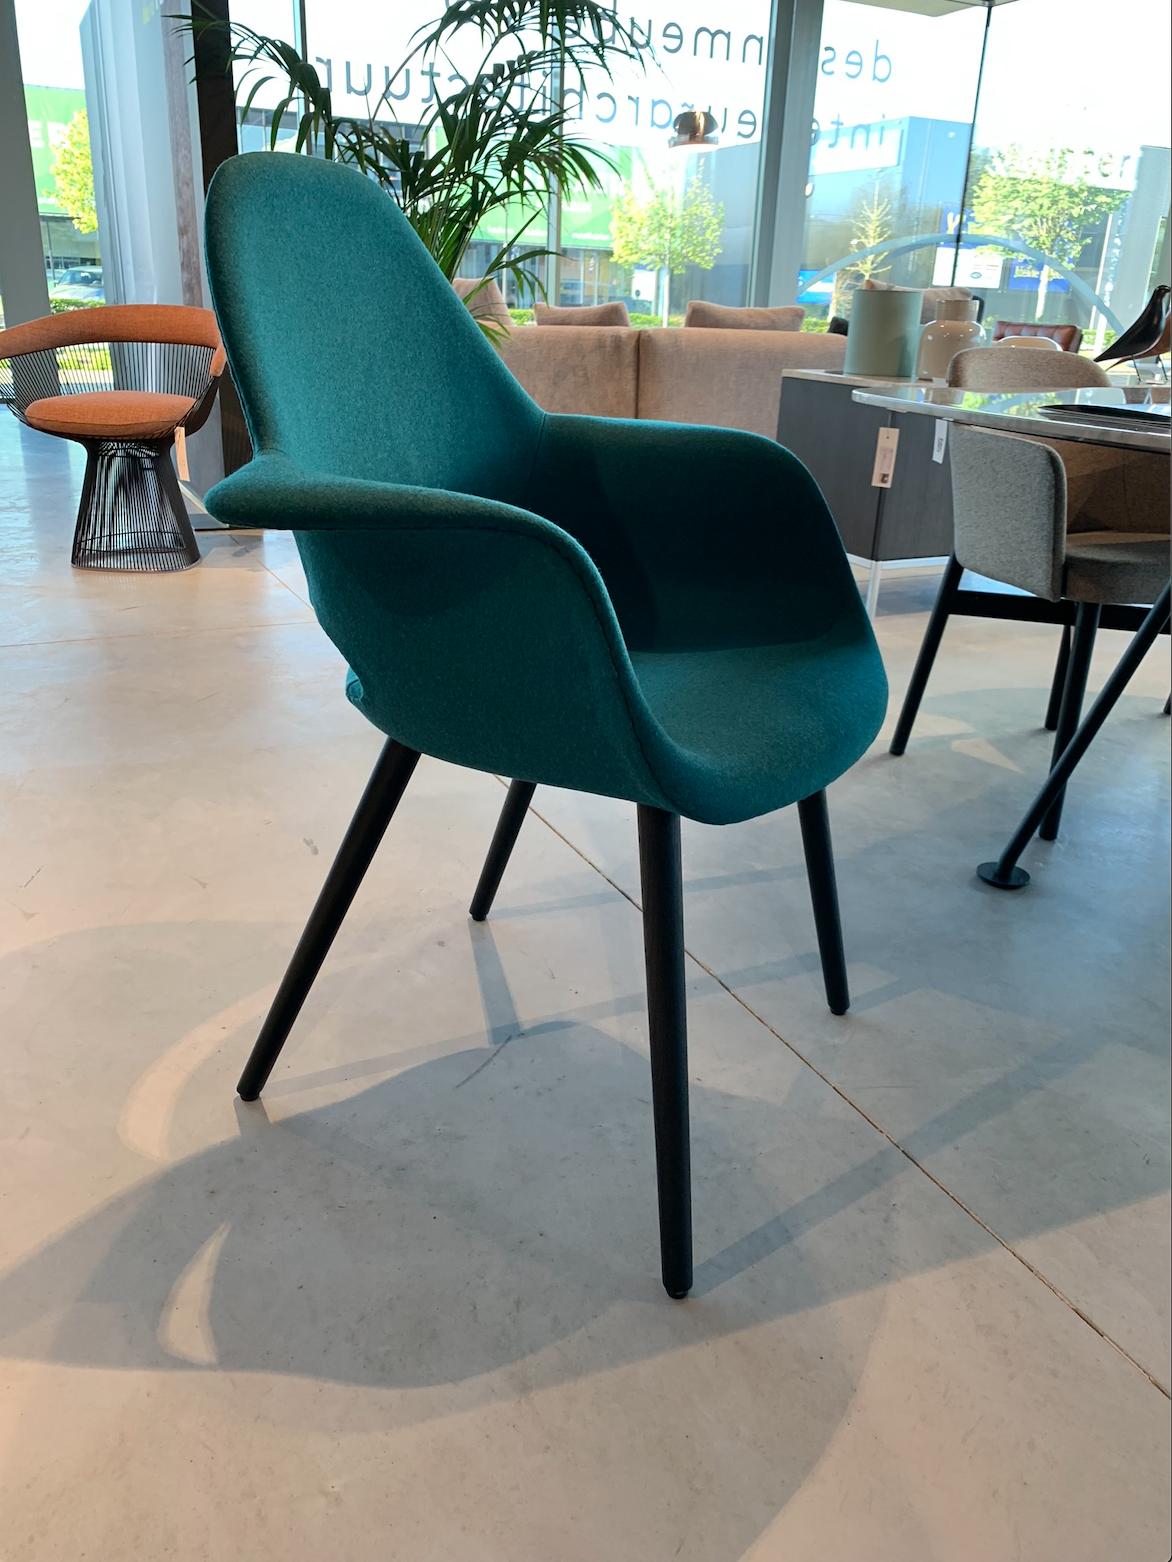 Organic Chair Vitra Hasselt Loncin interieur en design meubelwinkel vitra verdeler dealer Eames Saarinen.png